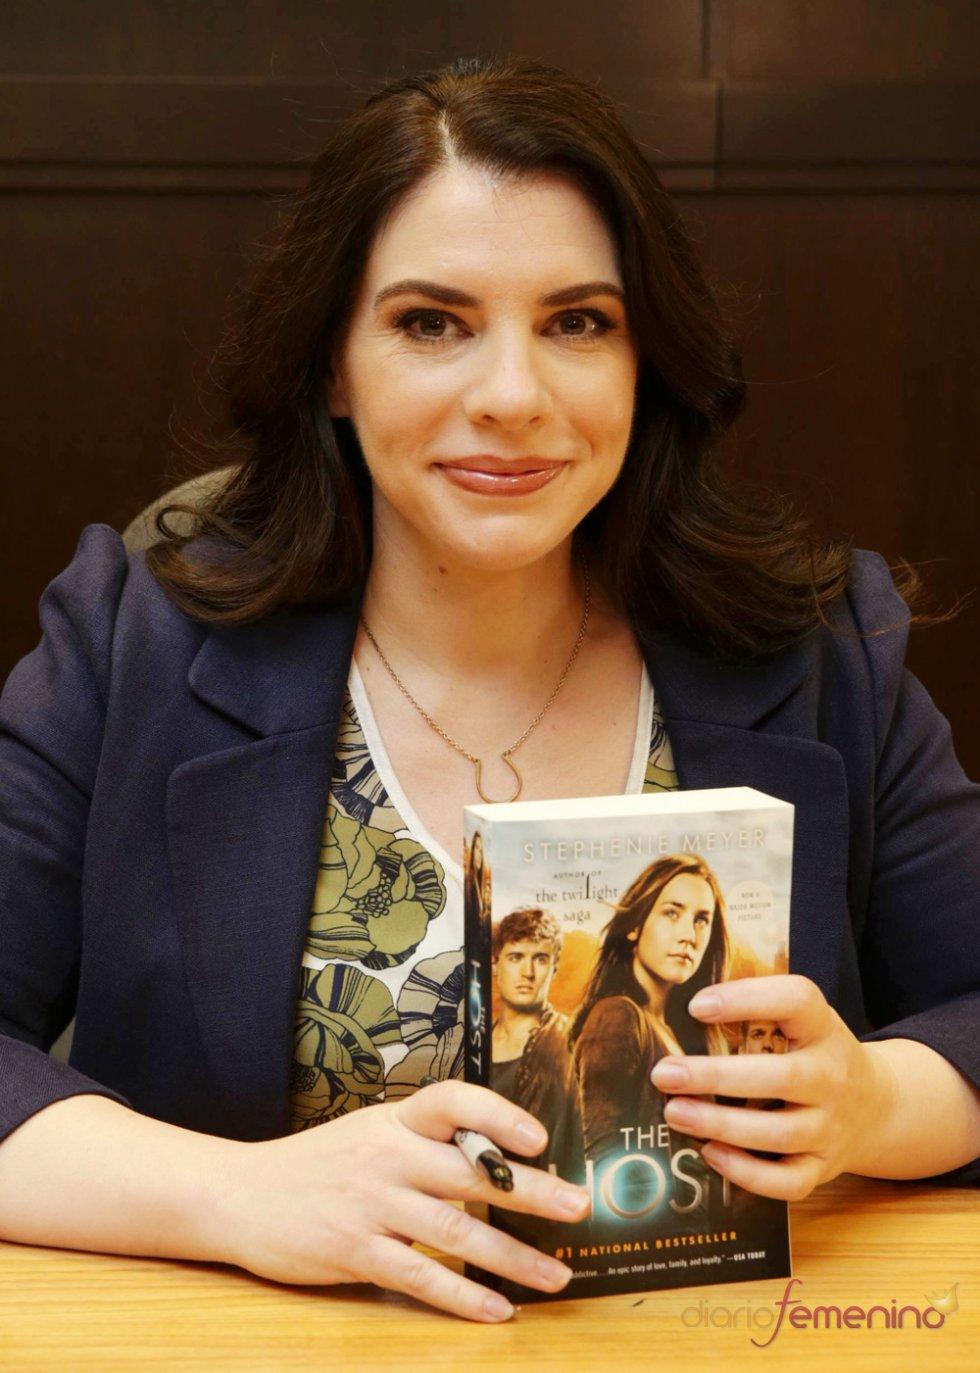 La fiebre de Stephenie Meyer vuelve con 'The Host' (La huésped)